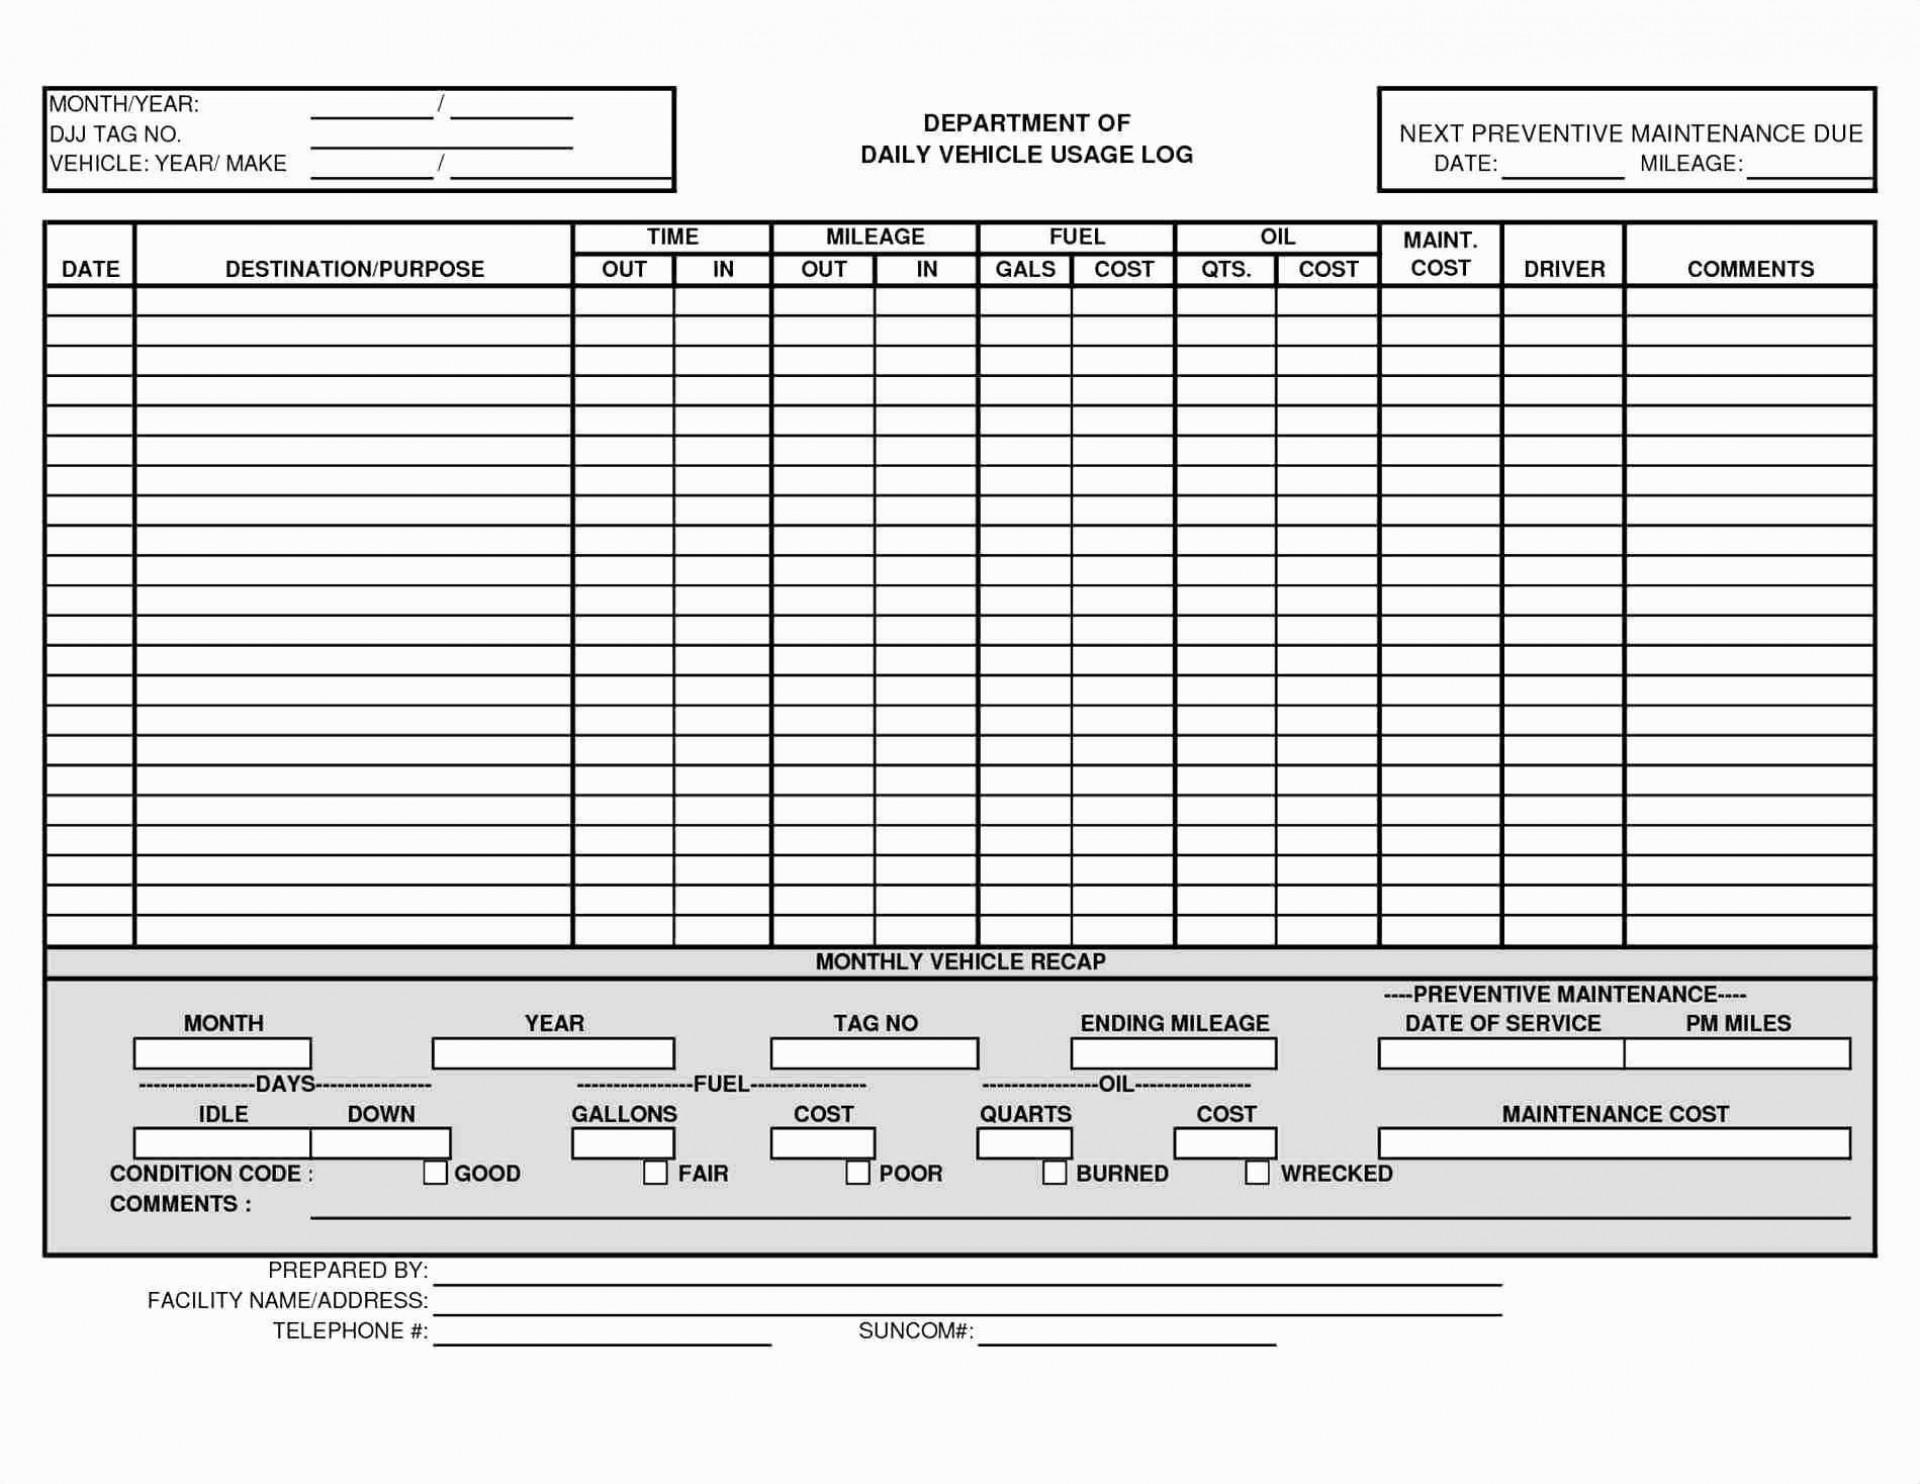 007 Surprising Fleet Vehicle Maintenance Log Template Concept  Excel1920